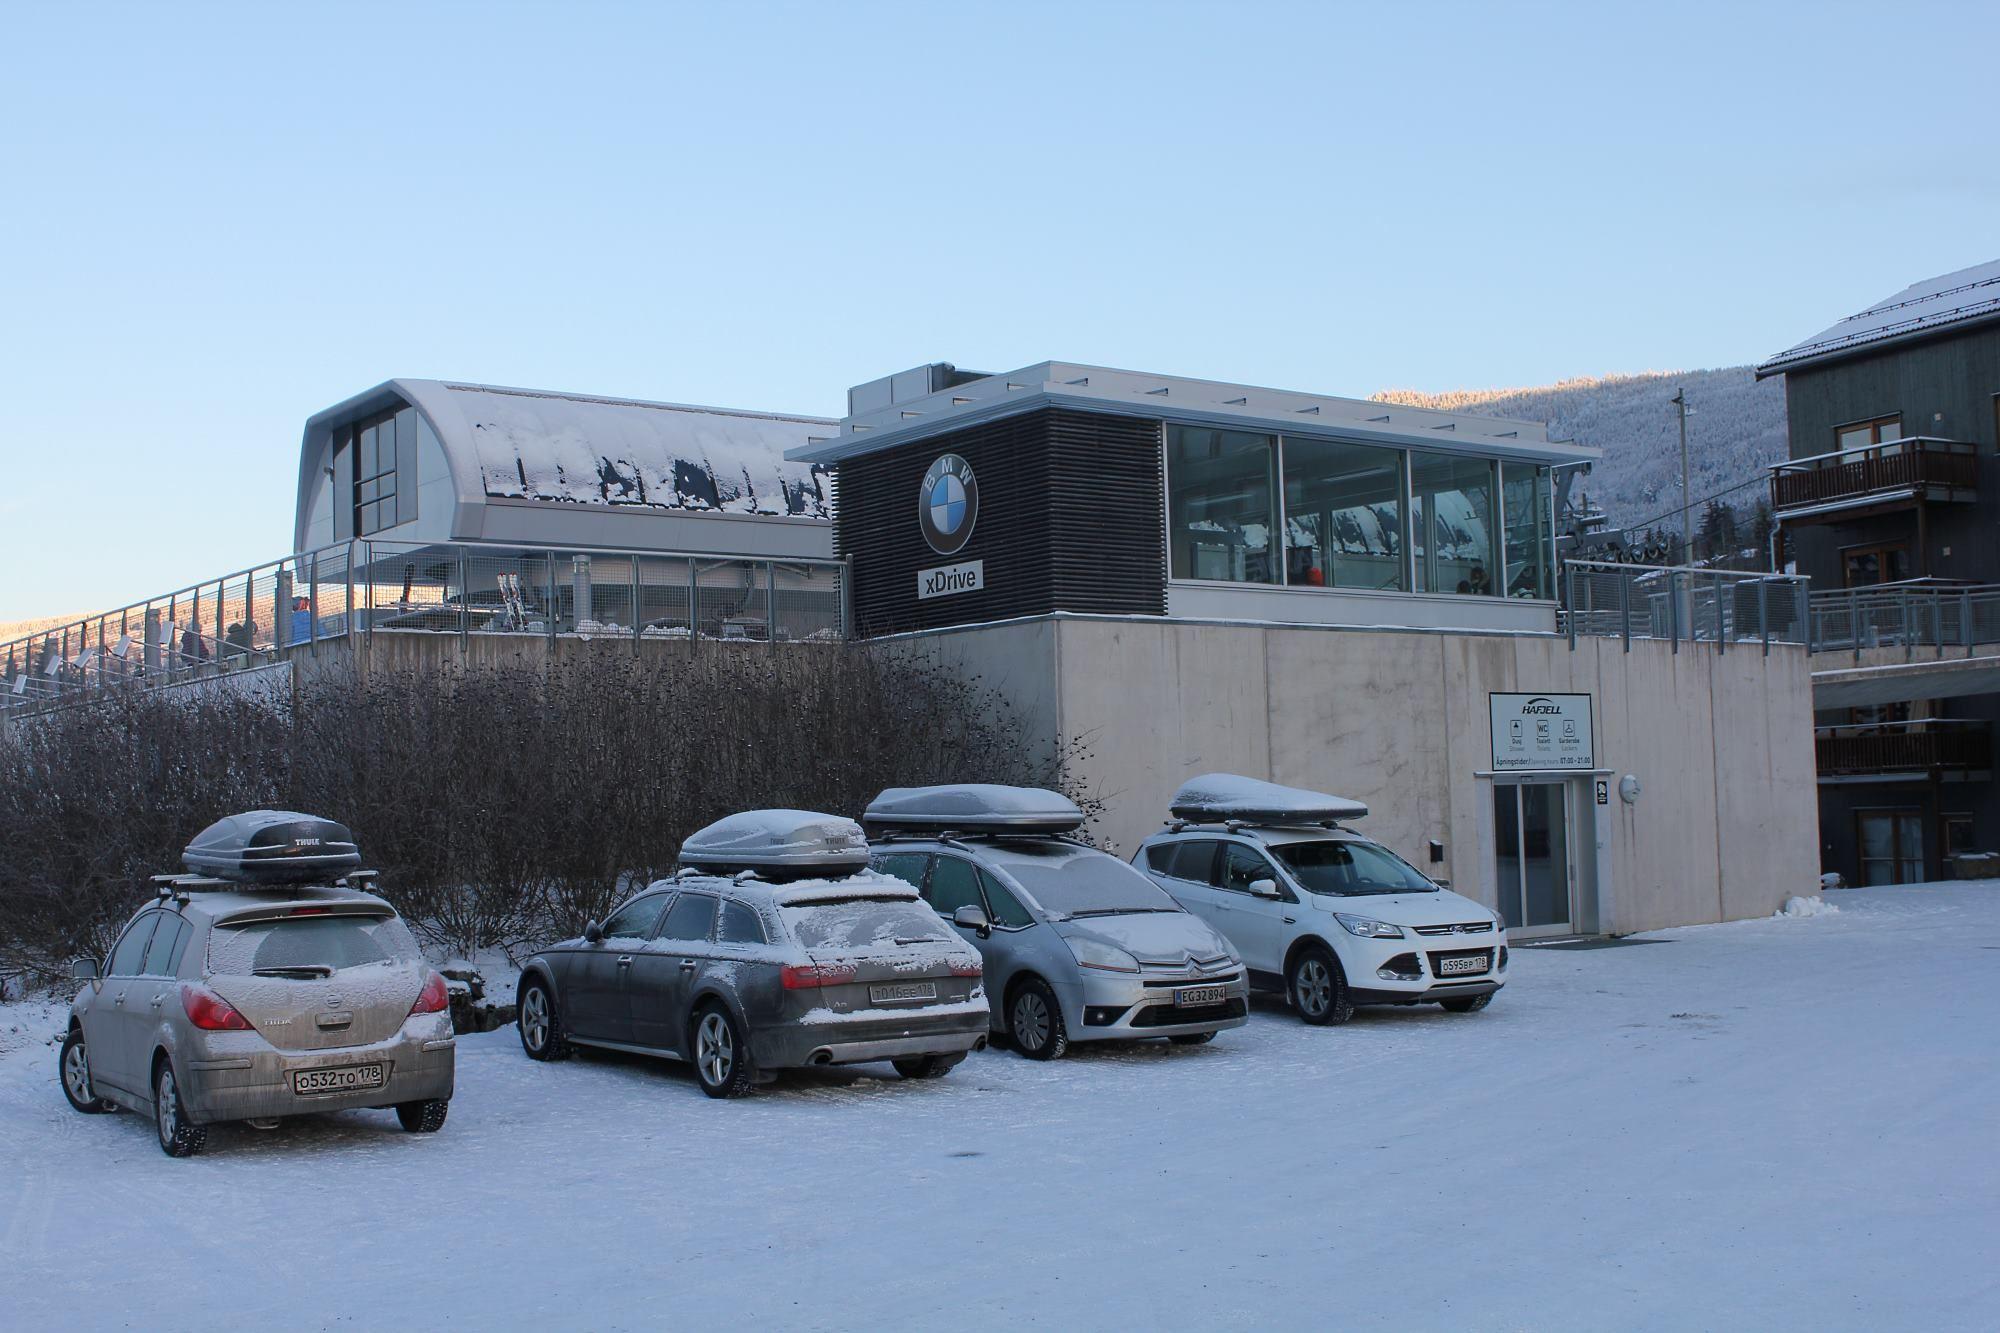 Rental of ski lockers at Hafjell